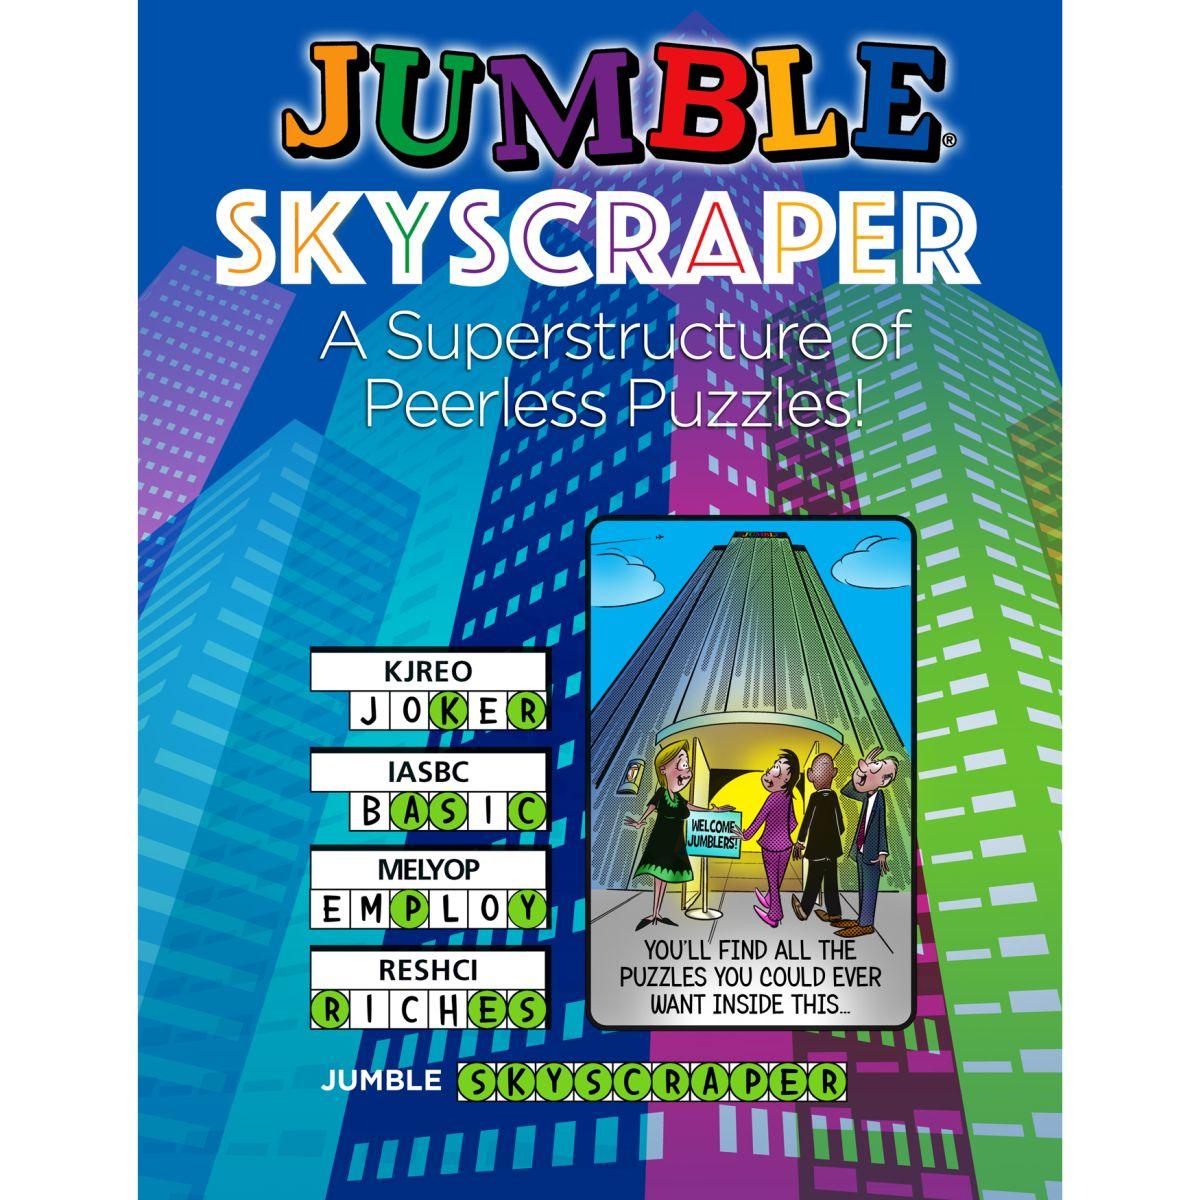 Jumble Skyscraper